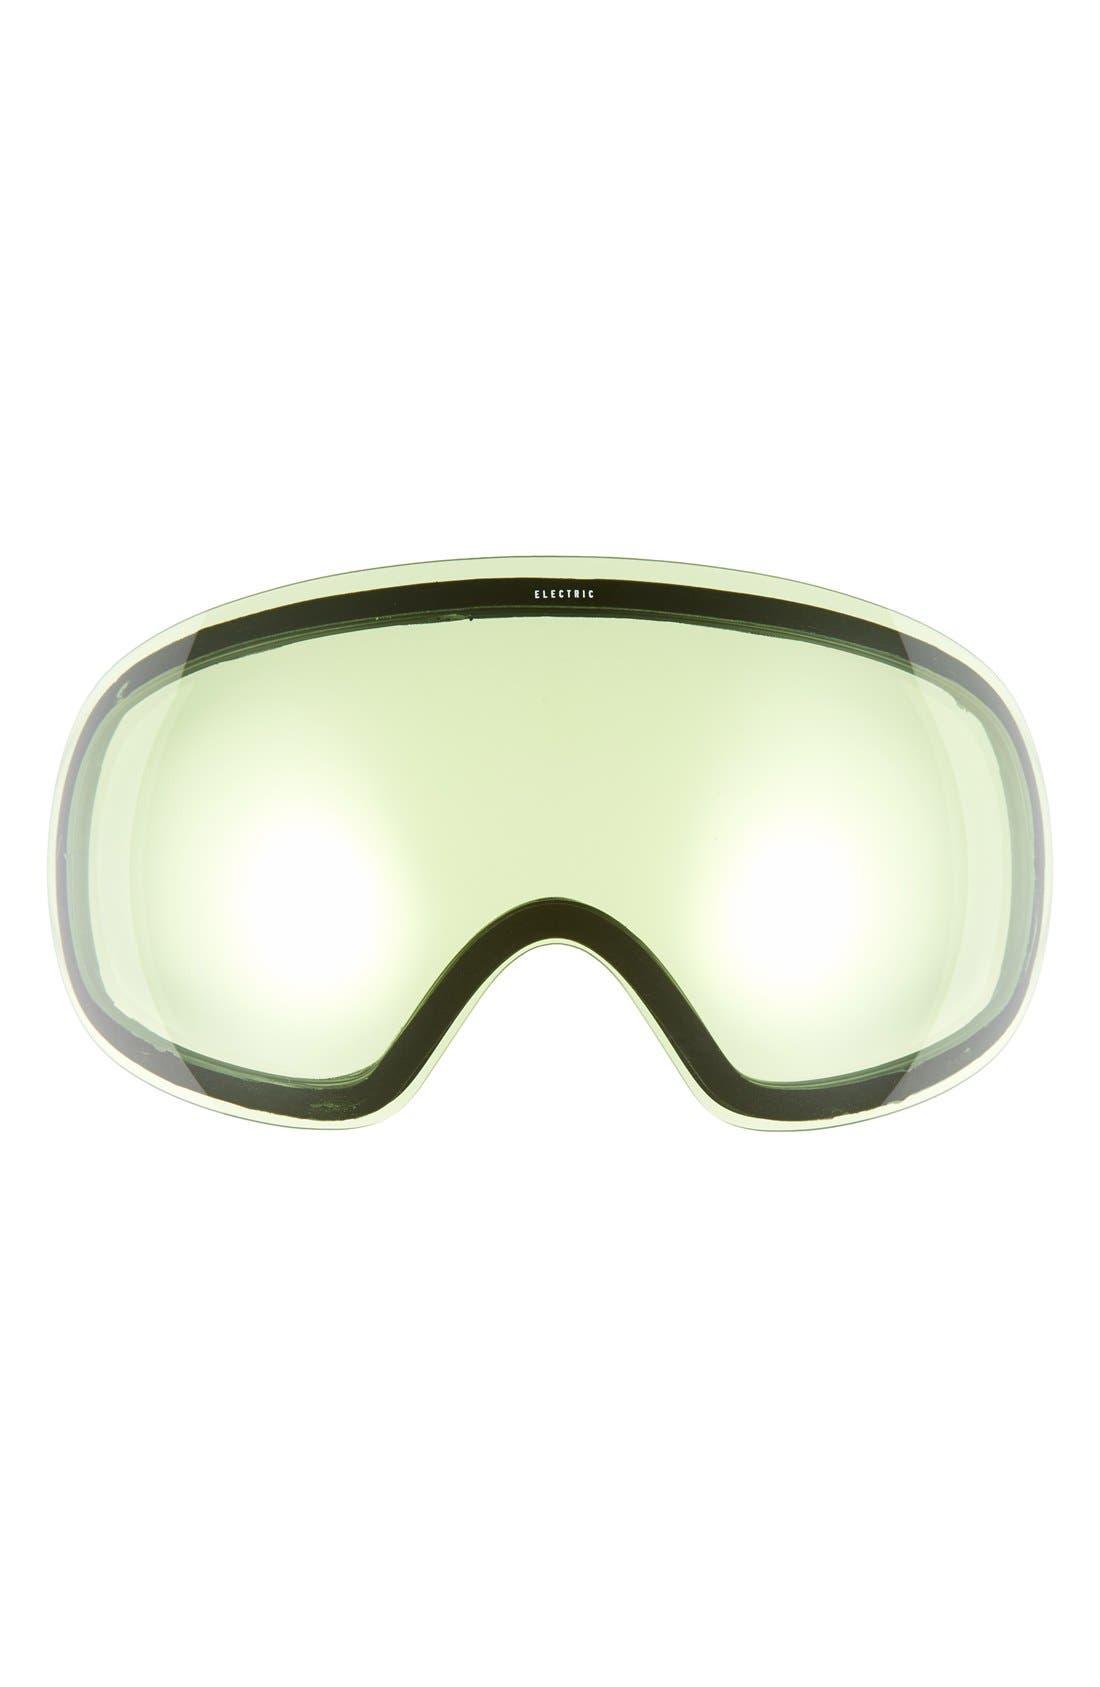 EG3 254mm Snow Goggles,                             Alternate thumbnail 33, color,